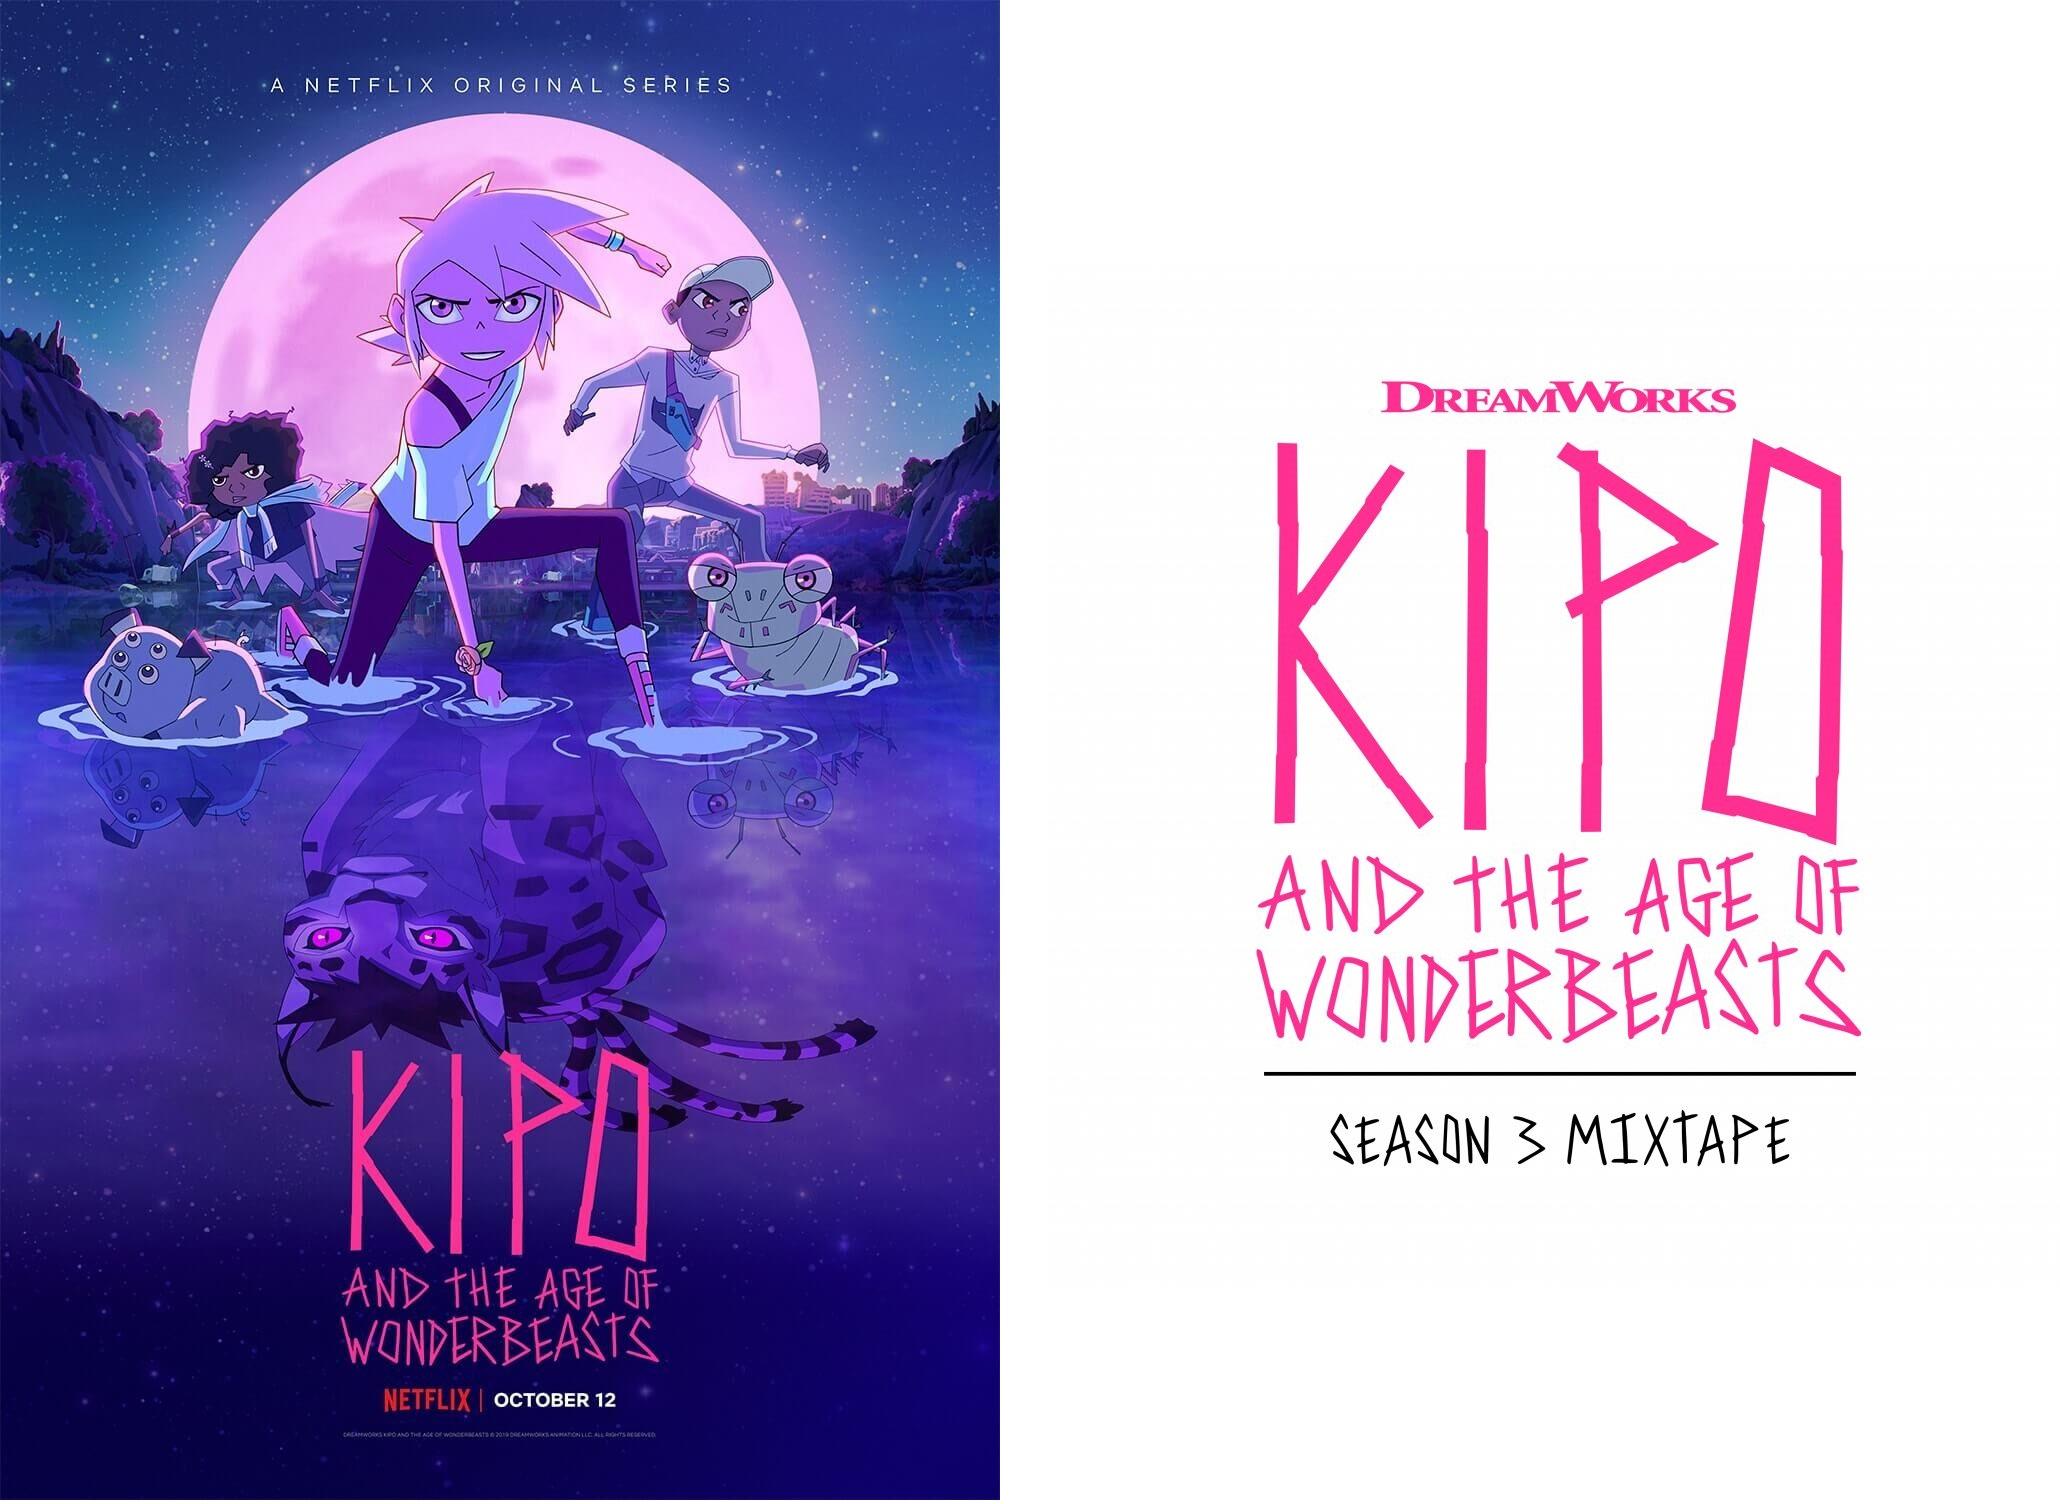 Kipo et l'âge des Animonstres Saison 3 (Kipo and the Age of Wonderbeasts)